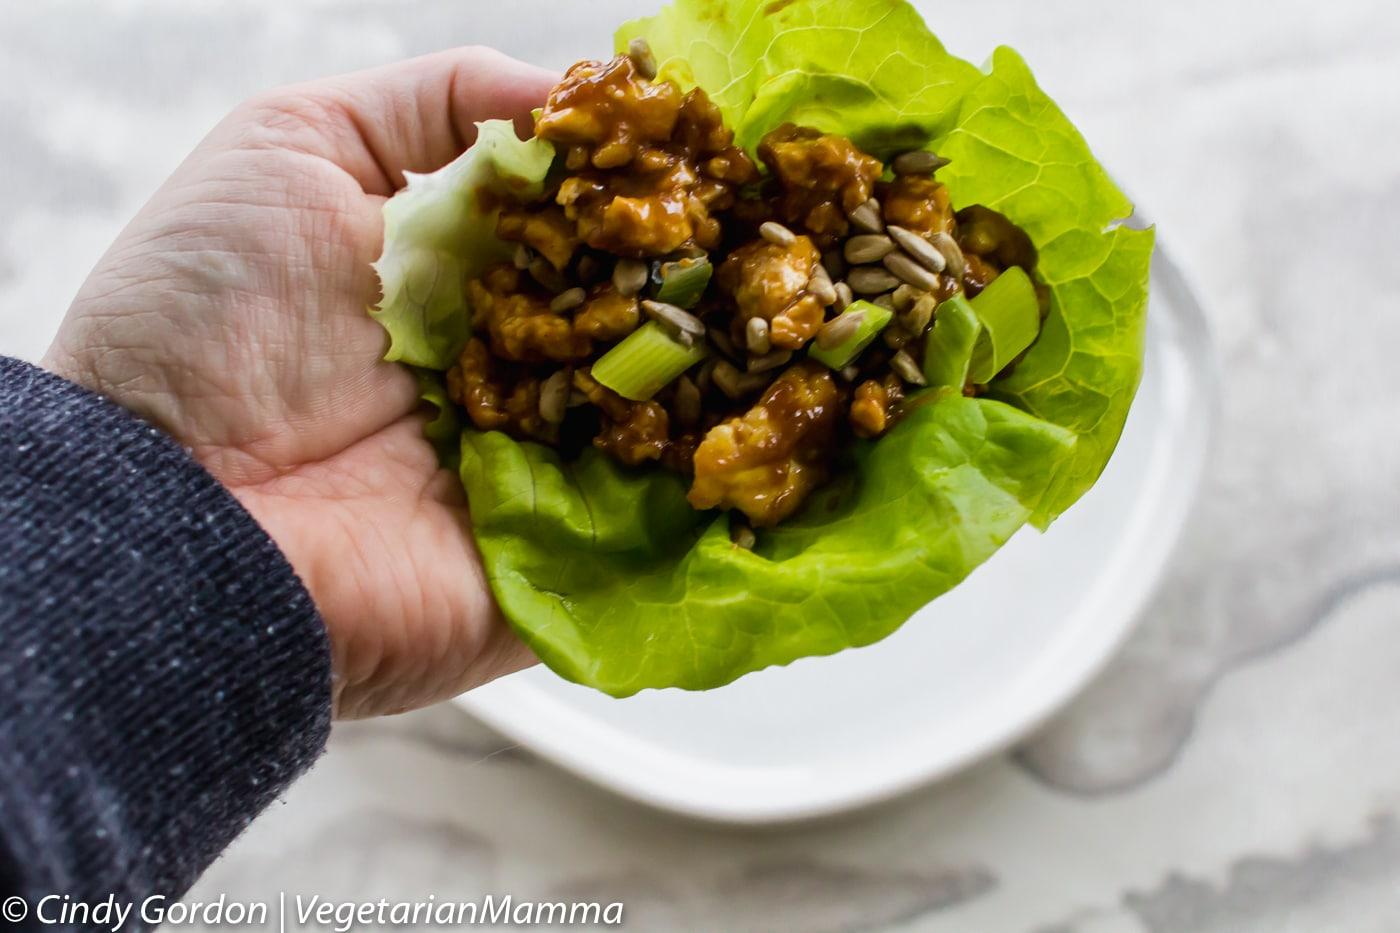 hand holding a vegetarian Thai Lettuce Wrap